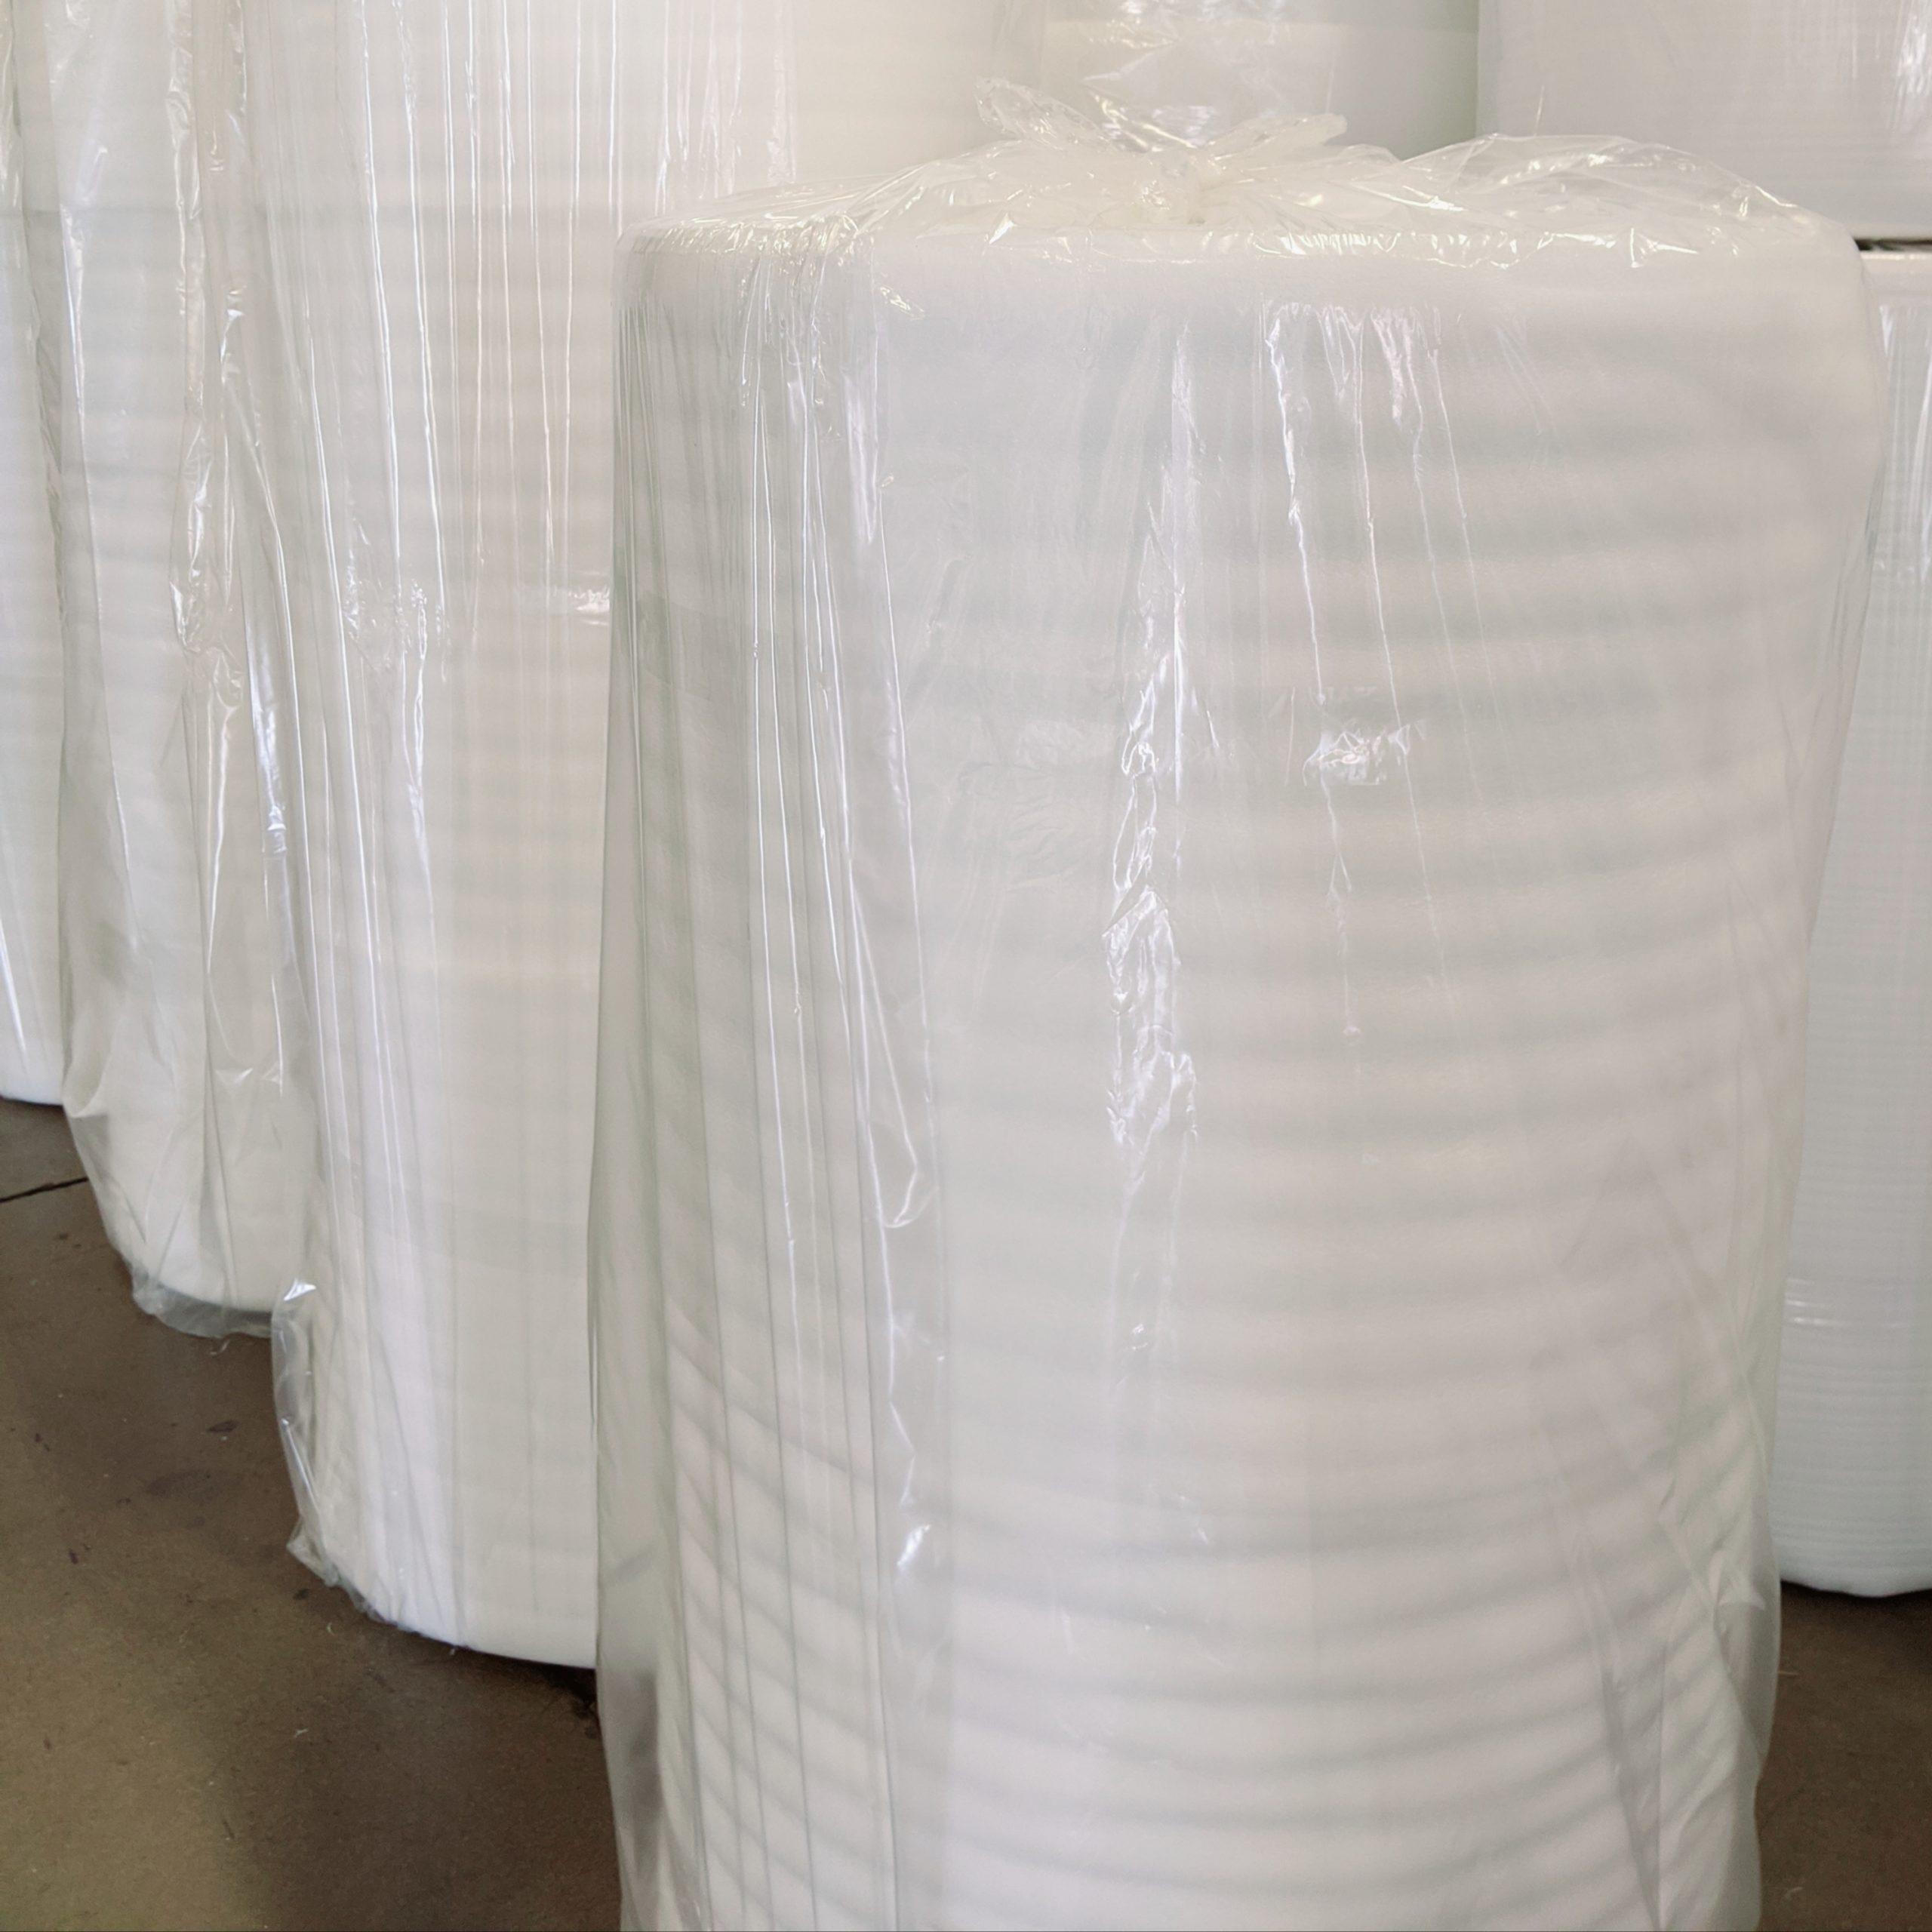 Packing Foam Rolls Split Perforated